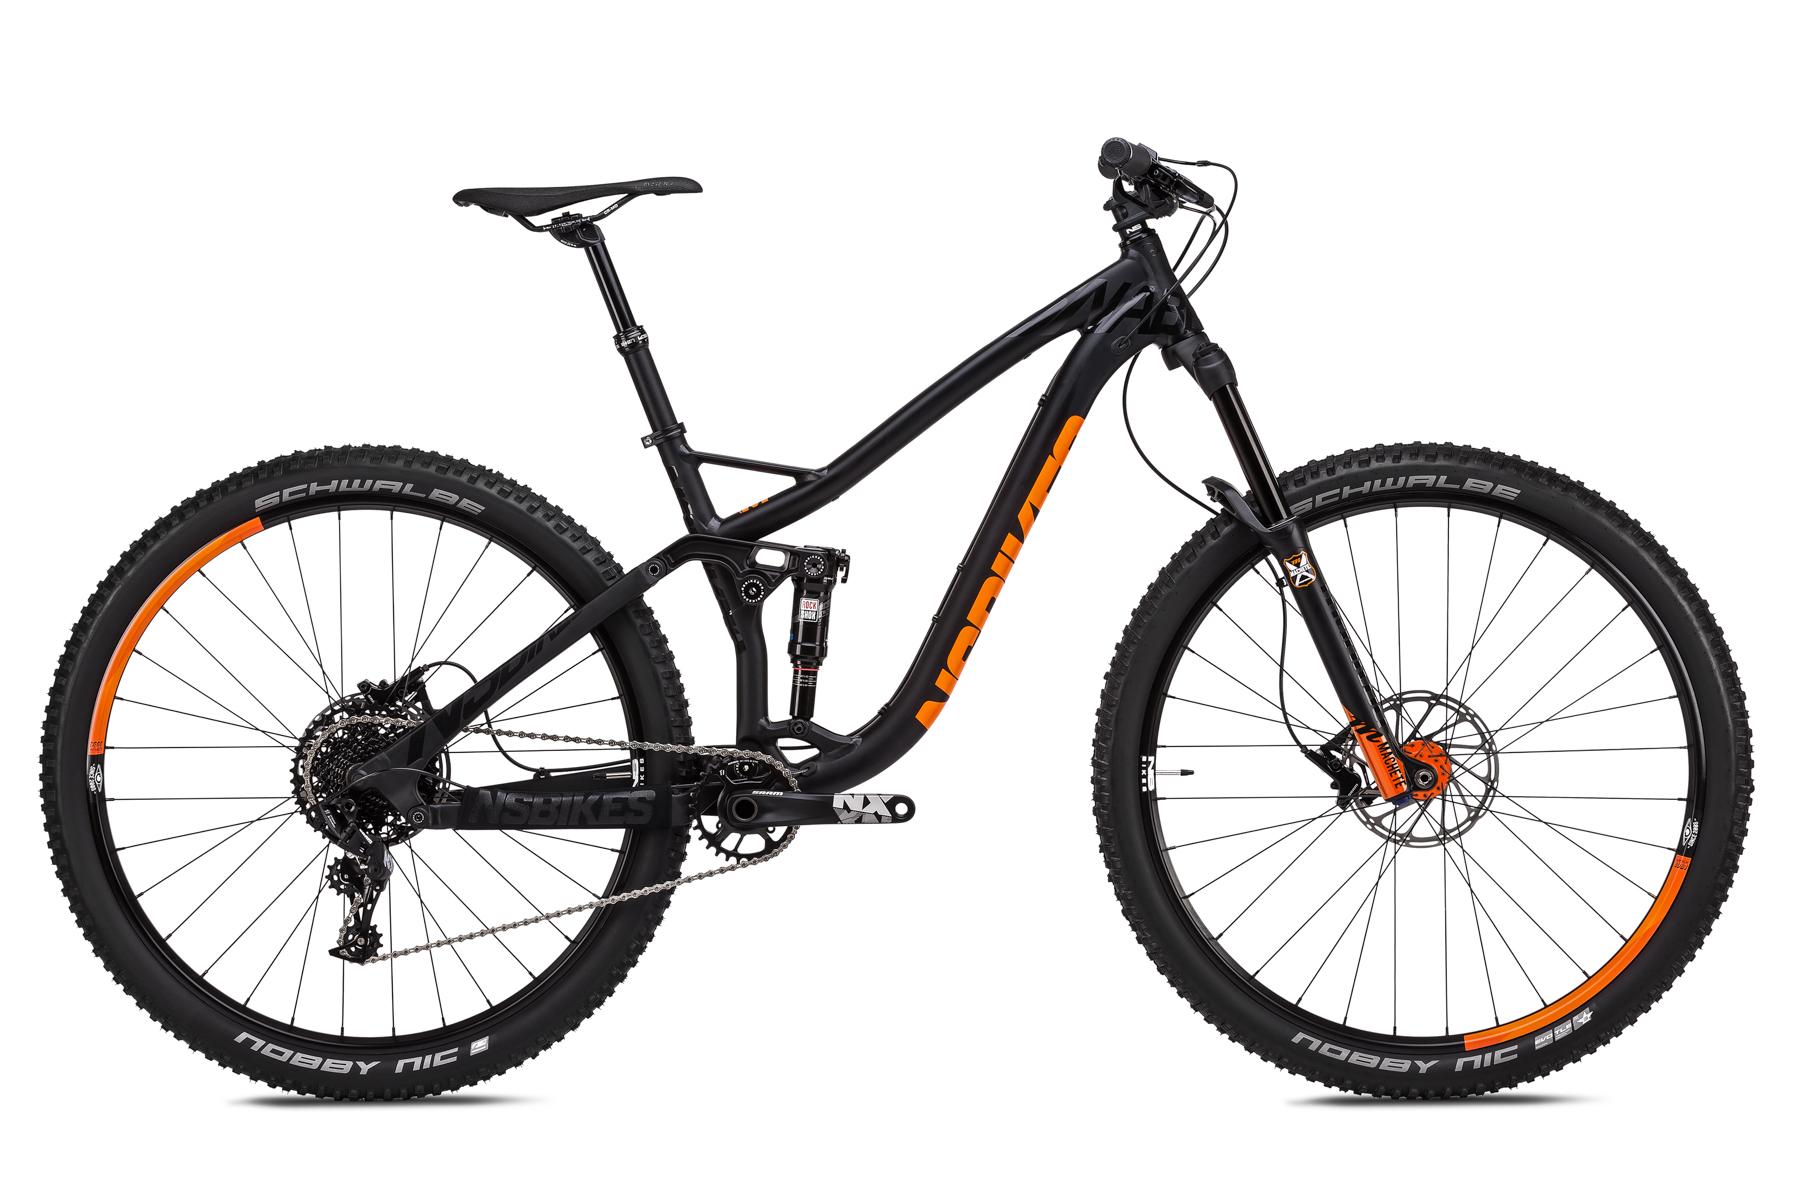 ns bikes snabb plus 2 29 zoll 650b online kaufen bmo bike mailorder. Black Bedroom Furniture Sets. Home Design Ideas